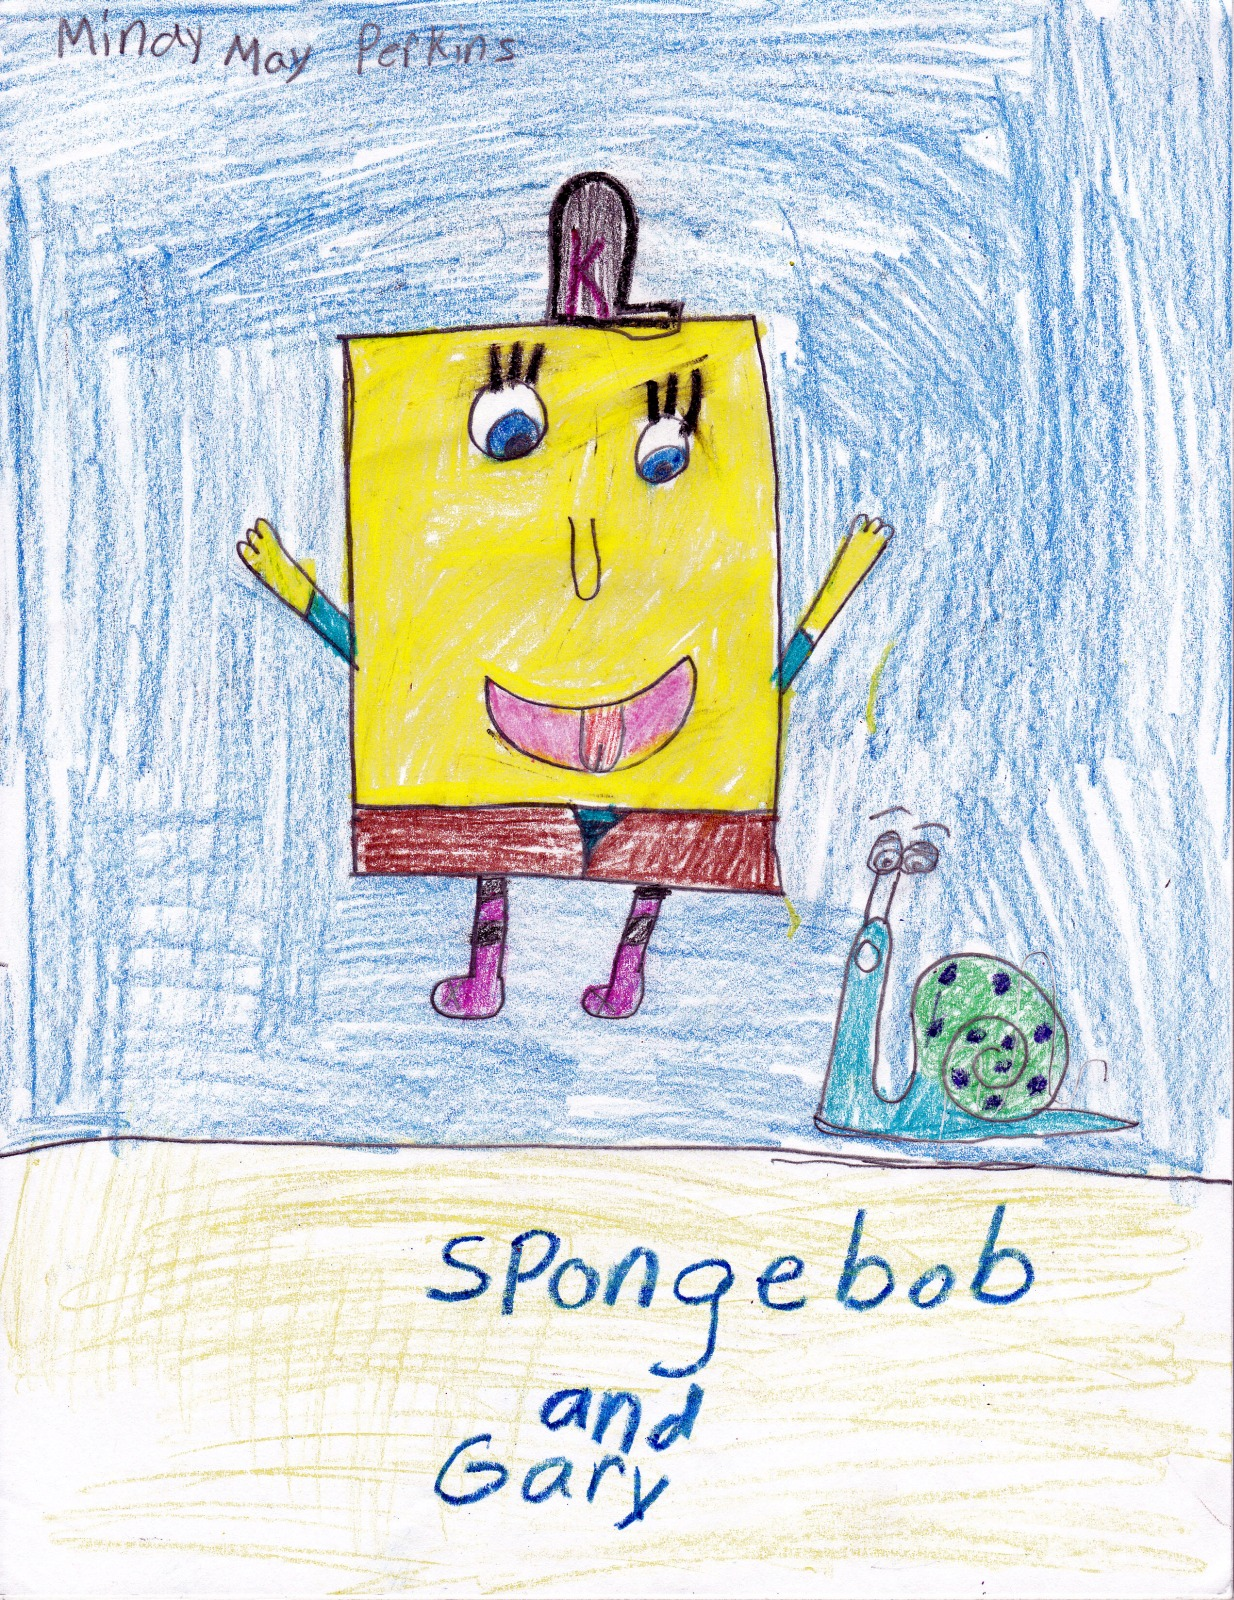 Spongebob Squarepants & Gary, artwork by Mindy May Perkins